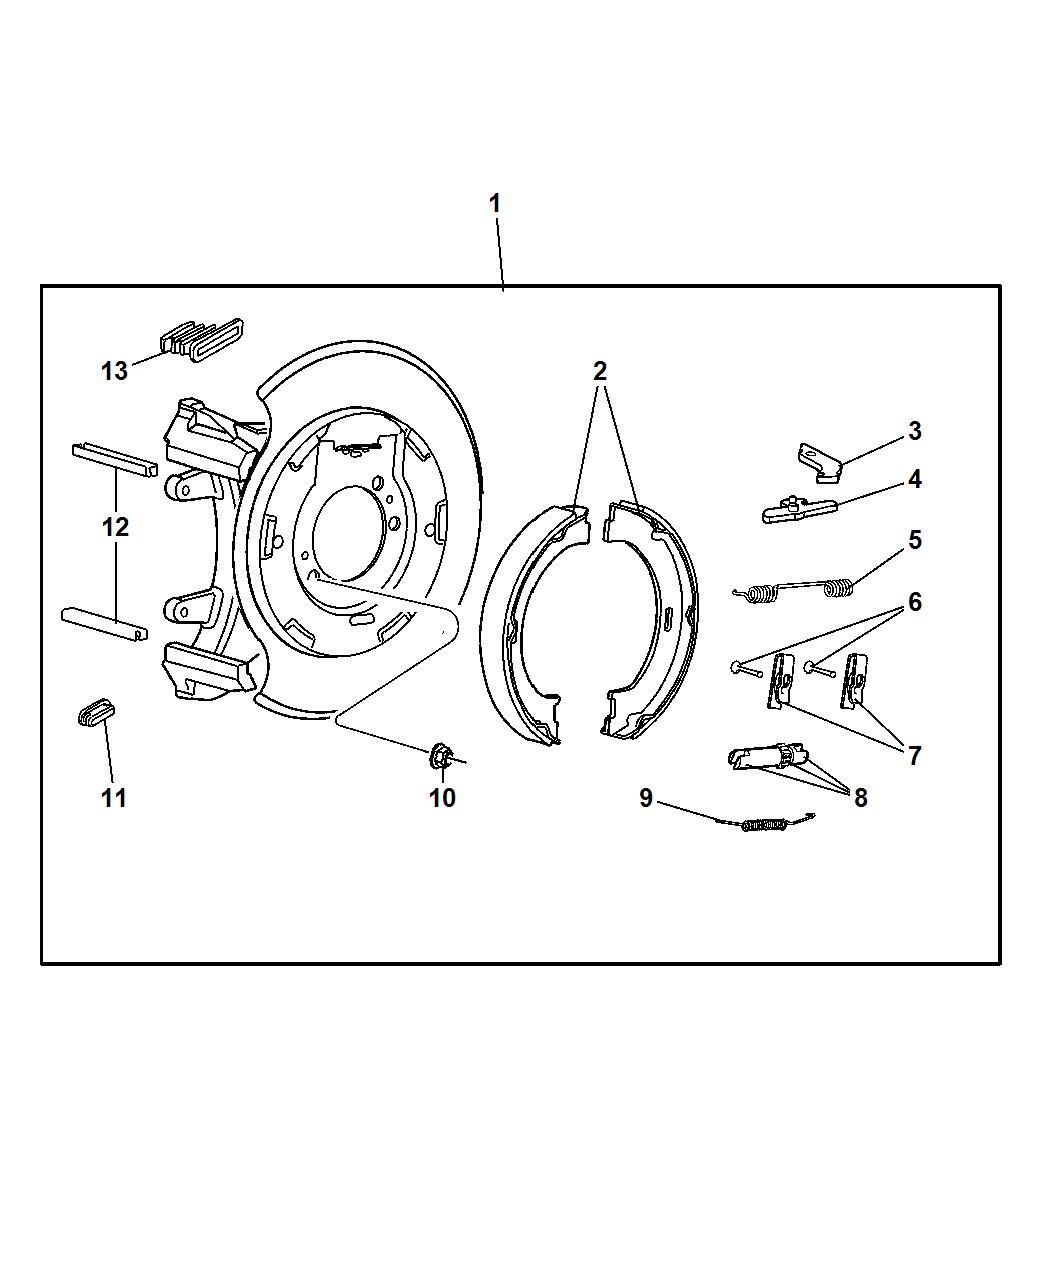 [EY_3800] Jeep Brakes Diagram Free Diagram